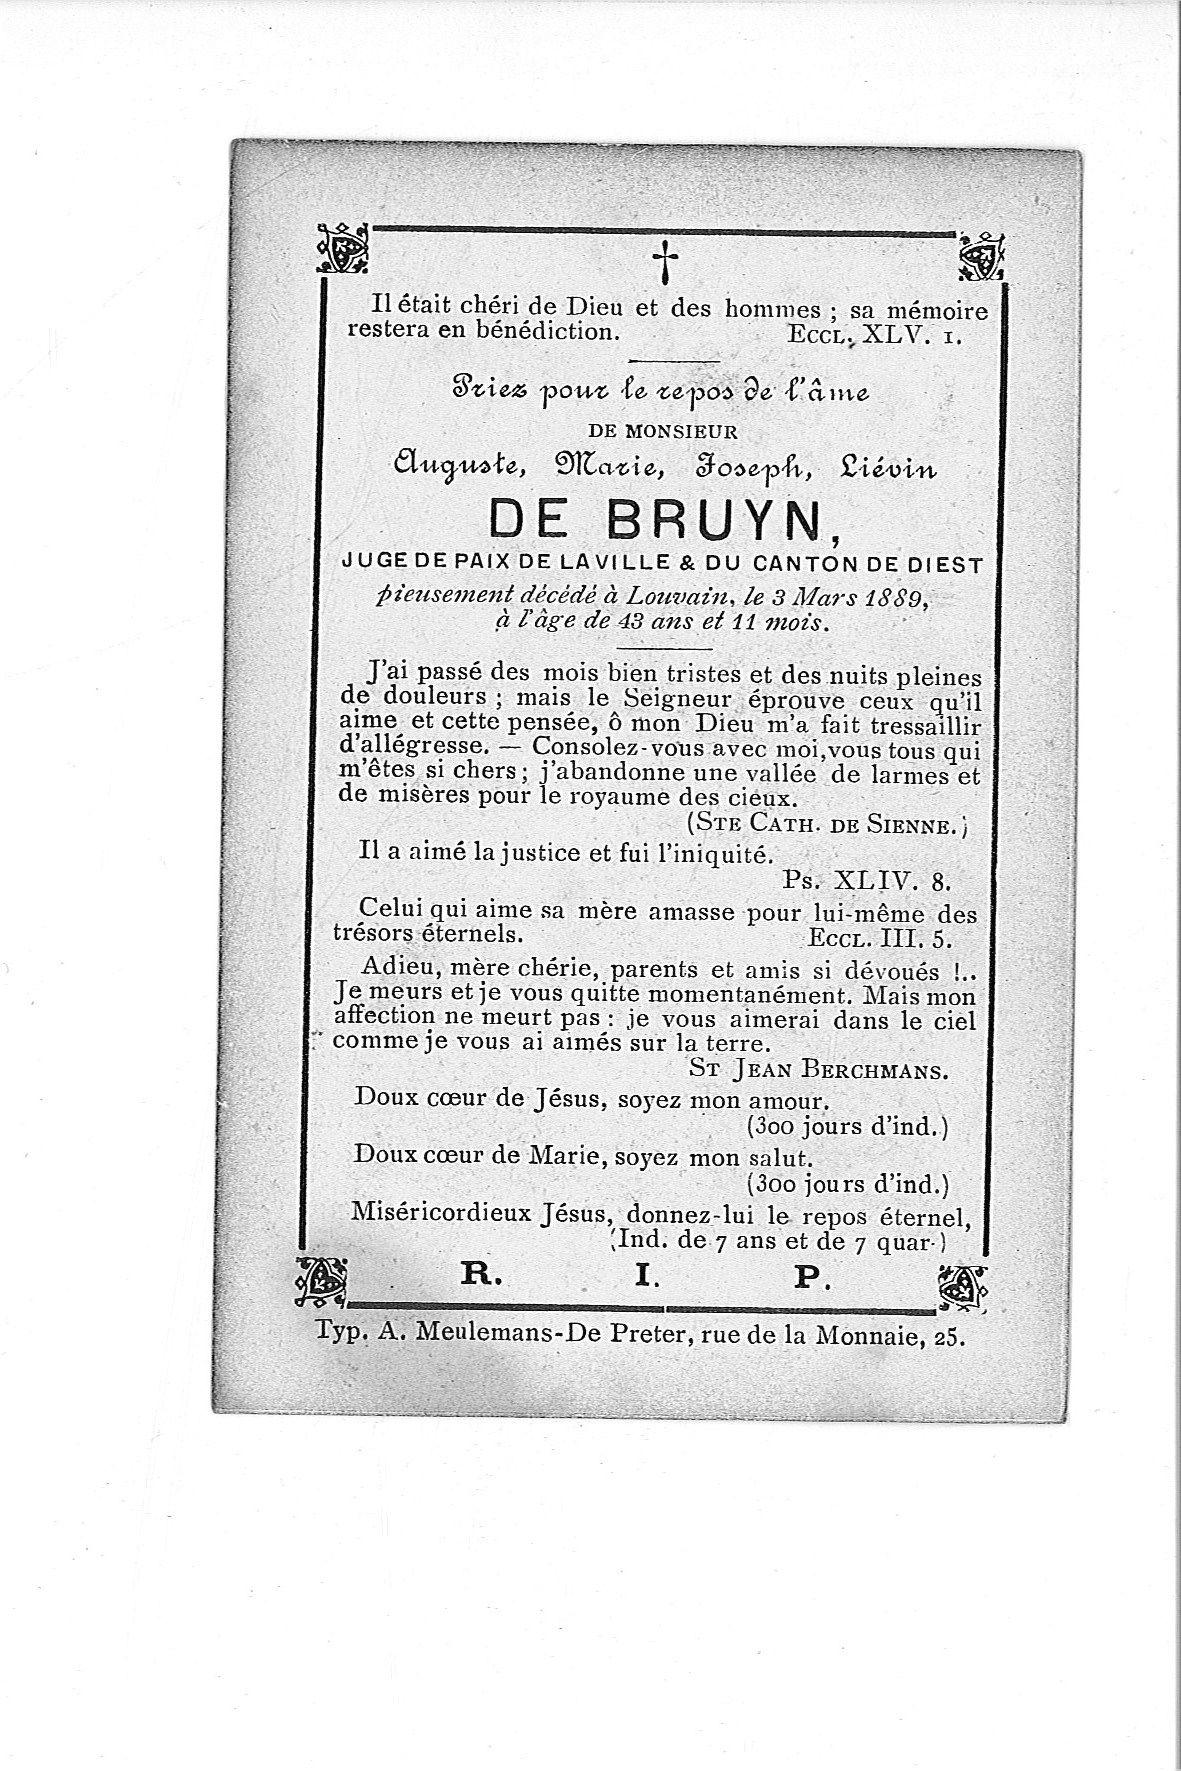 auguste-marie-joseph-lievin(1889)20090416093719_00026.jpg